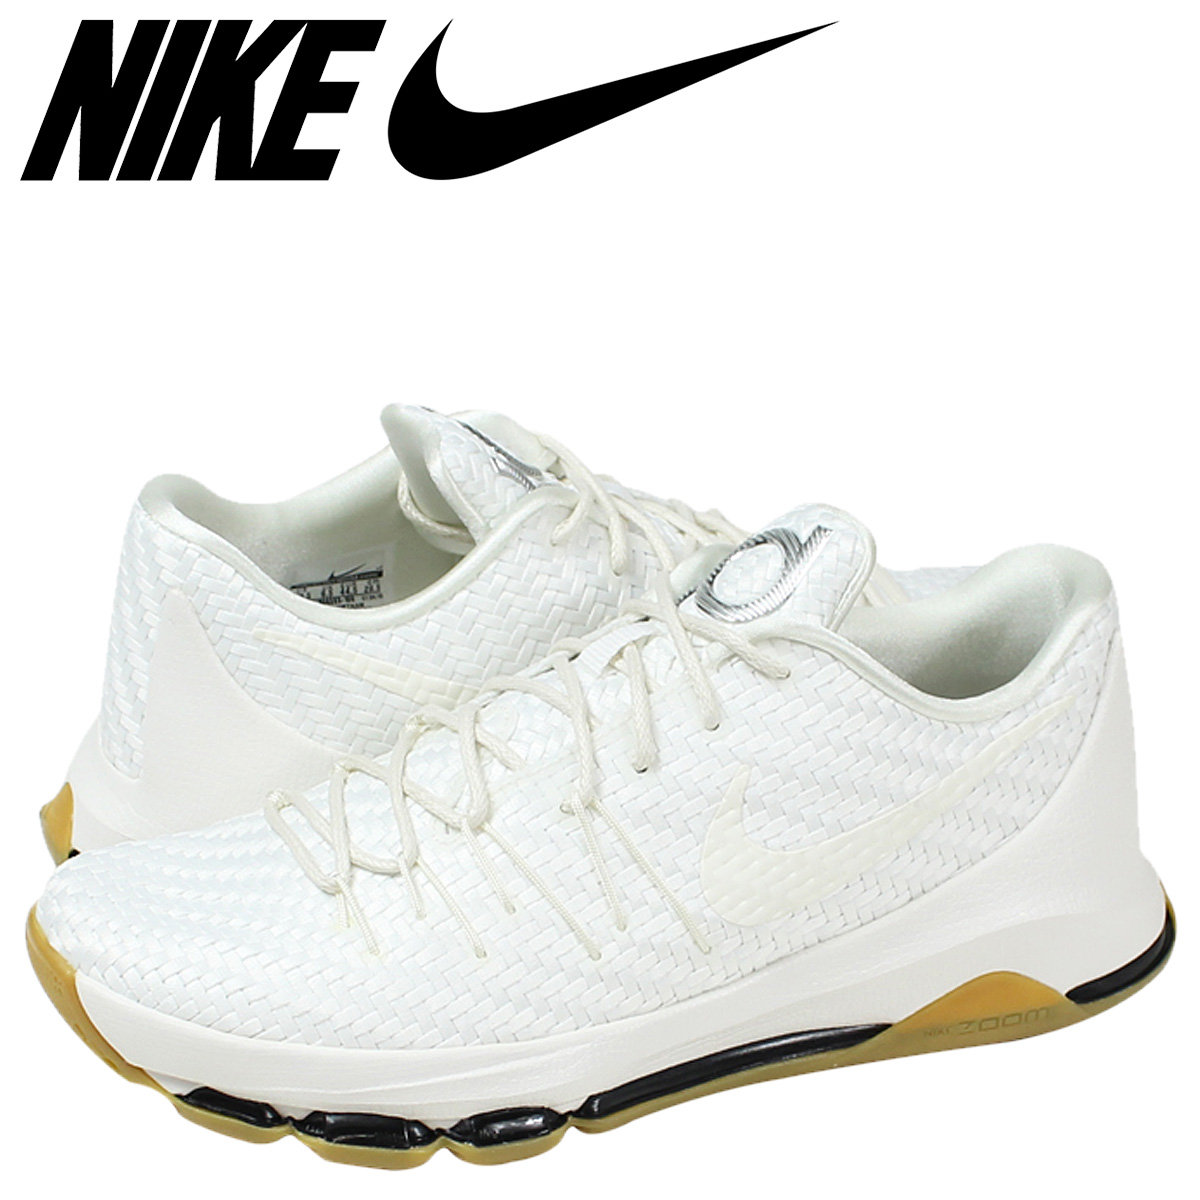 0be4b5a87ff6 Sugar Online Shop  Nike men s NIKE sneakers KD 8 EXT 806393-100 ...